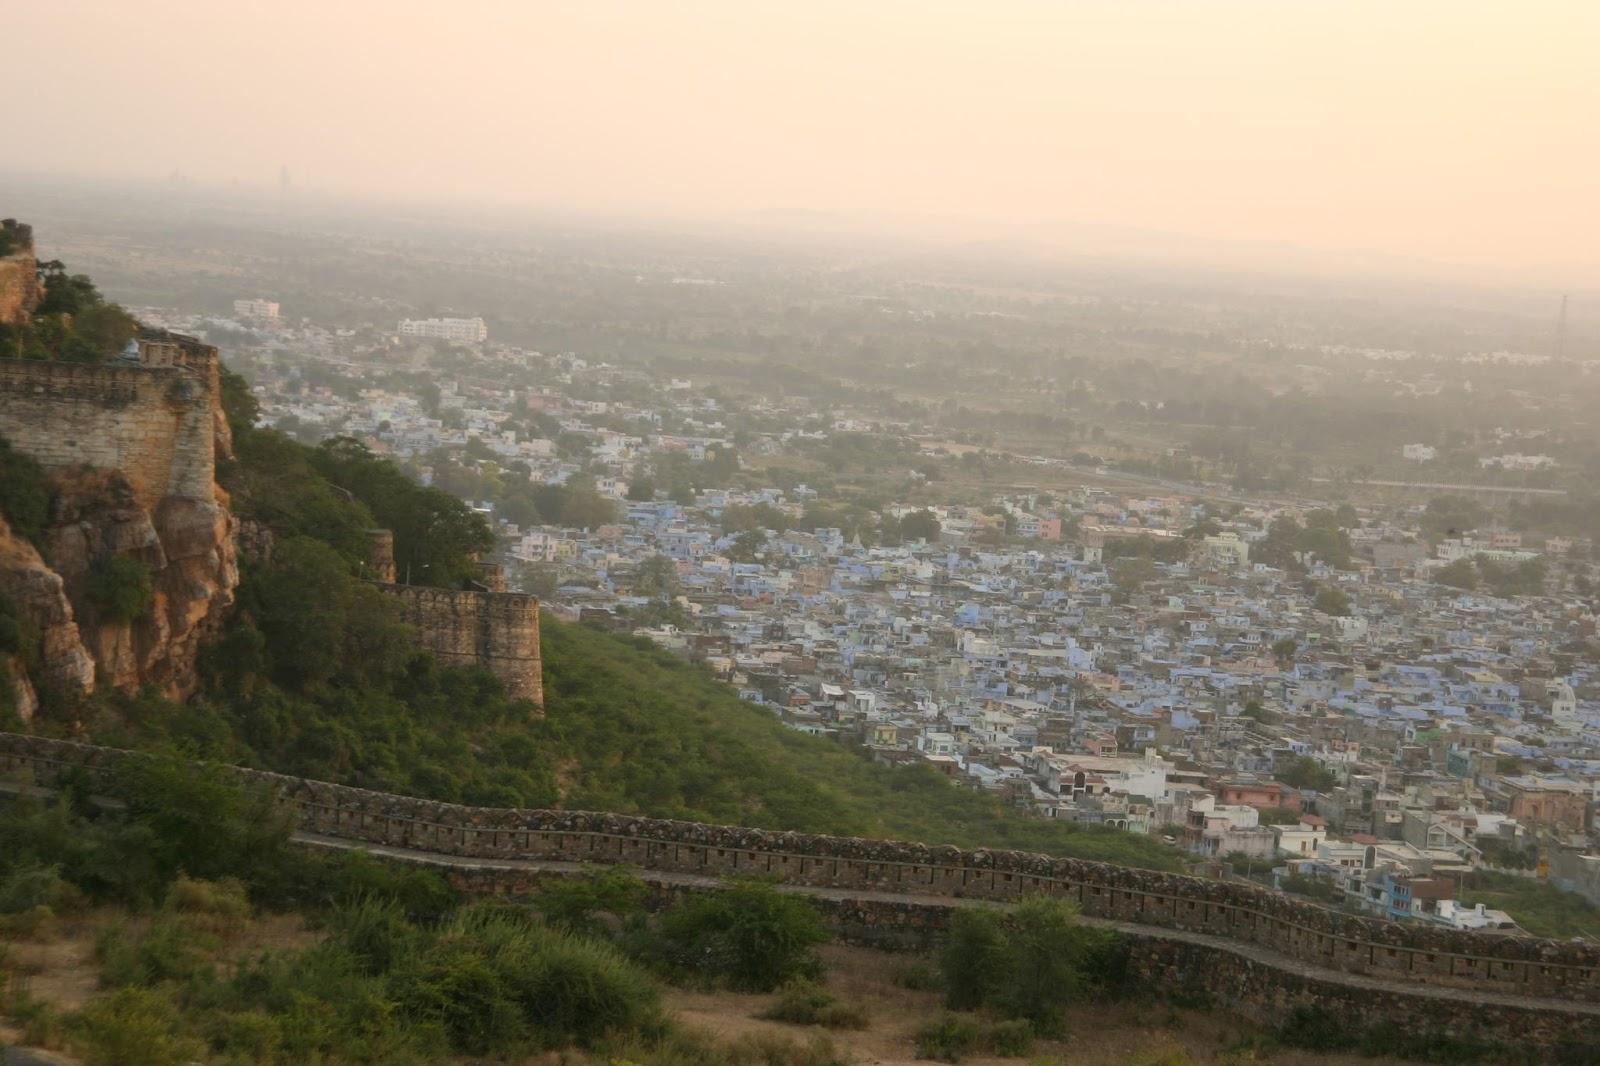 chittorgarh the historical city